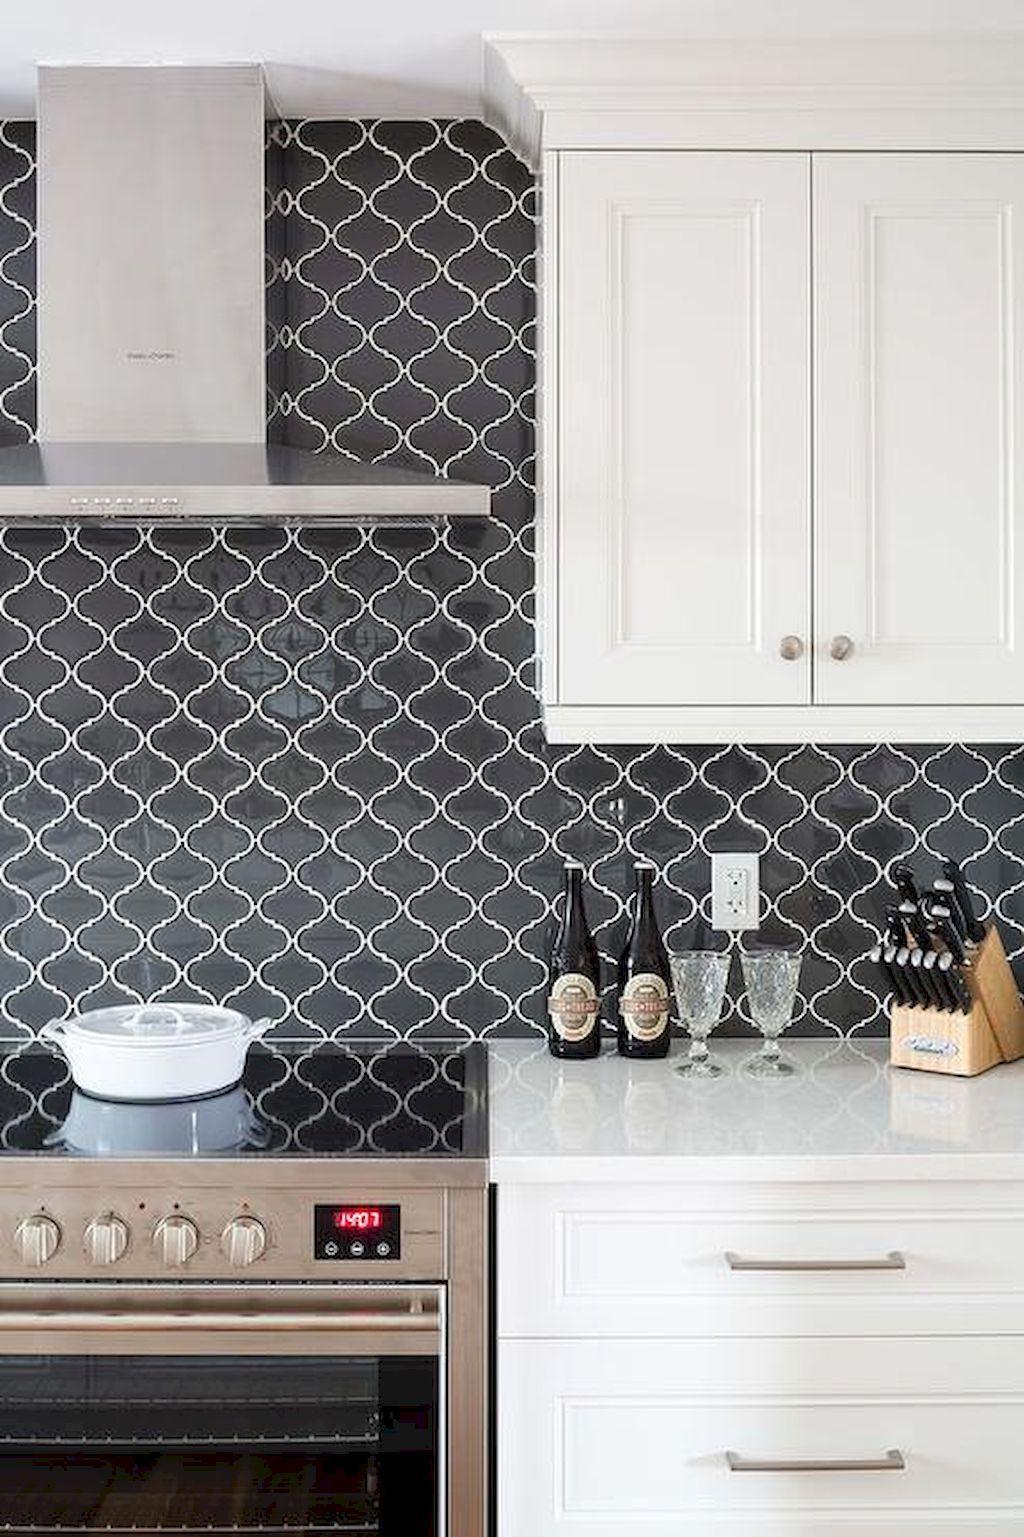 Beautiful kitchen backsplash tile patterns ideas (1